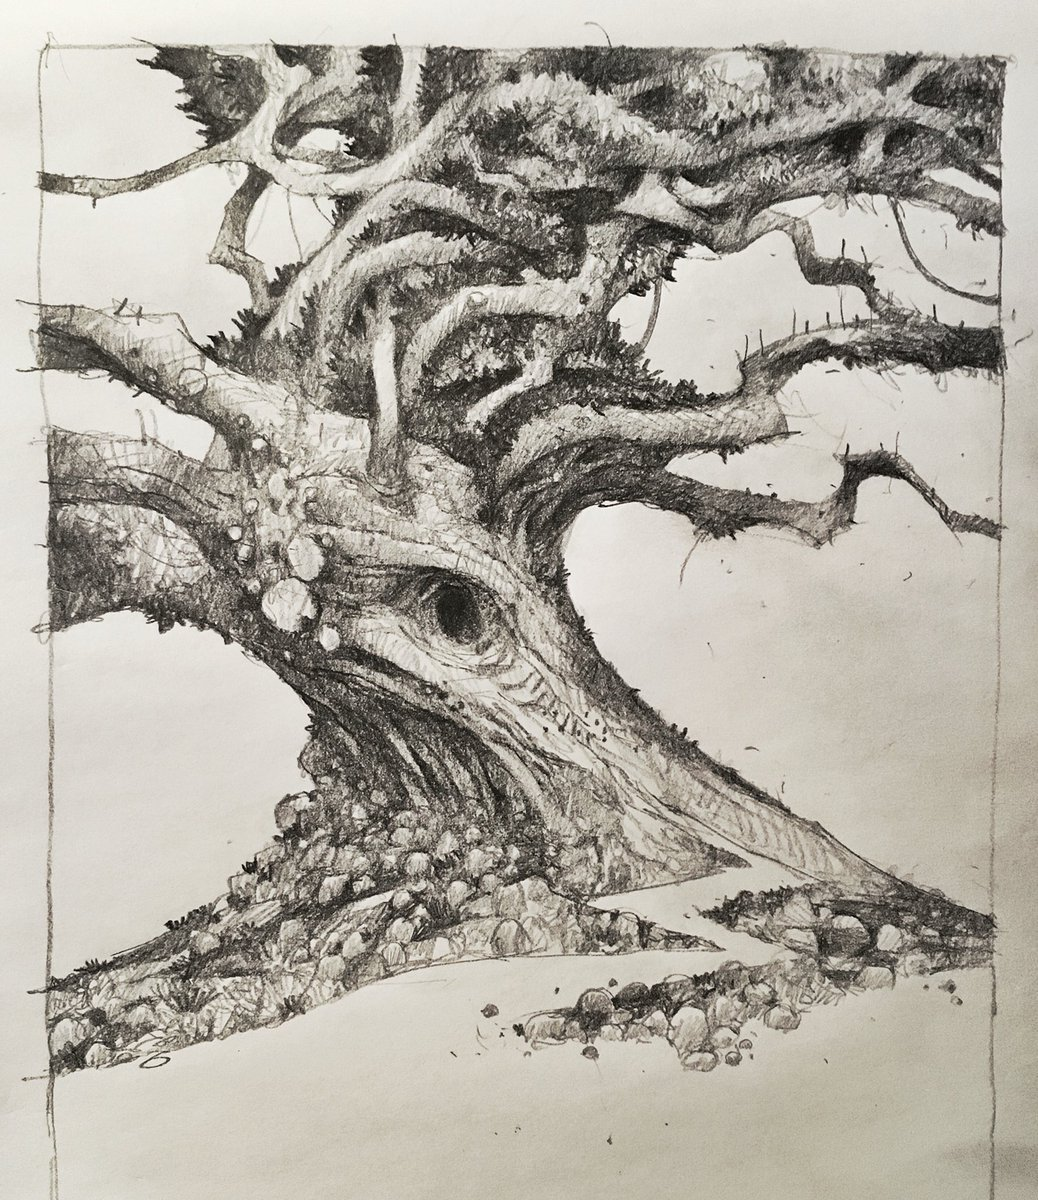 if in doubt, draw a tree. https://t.co/utZkYdzuNy